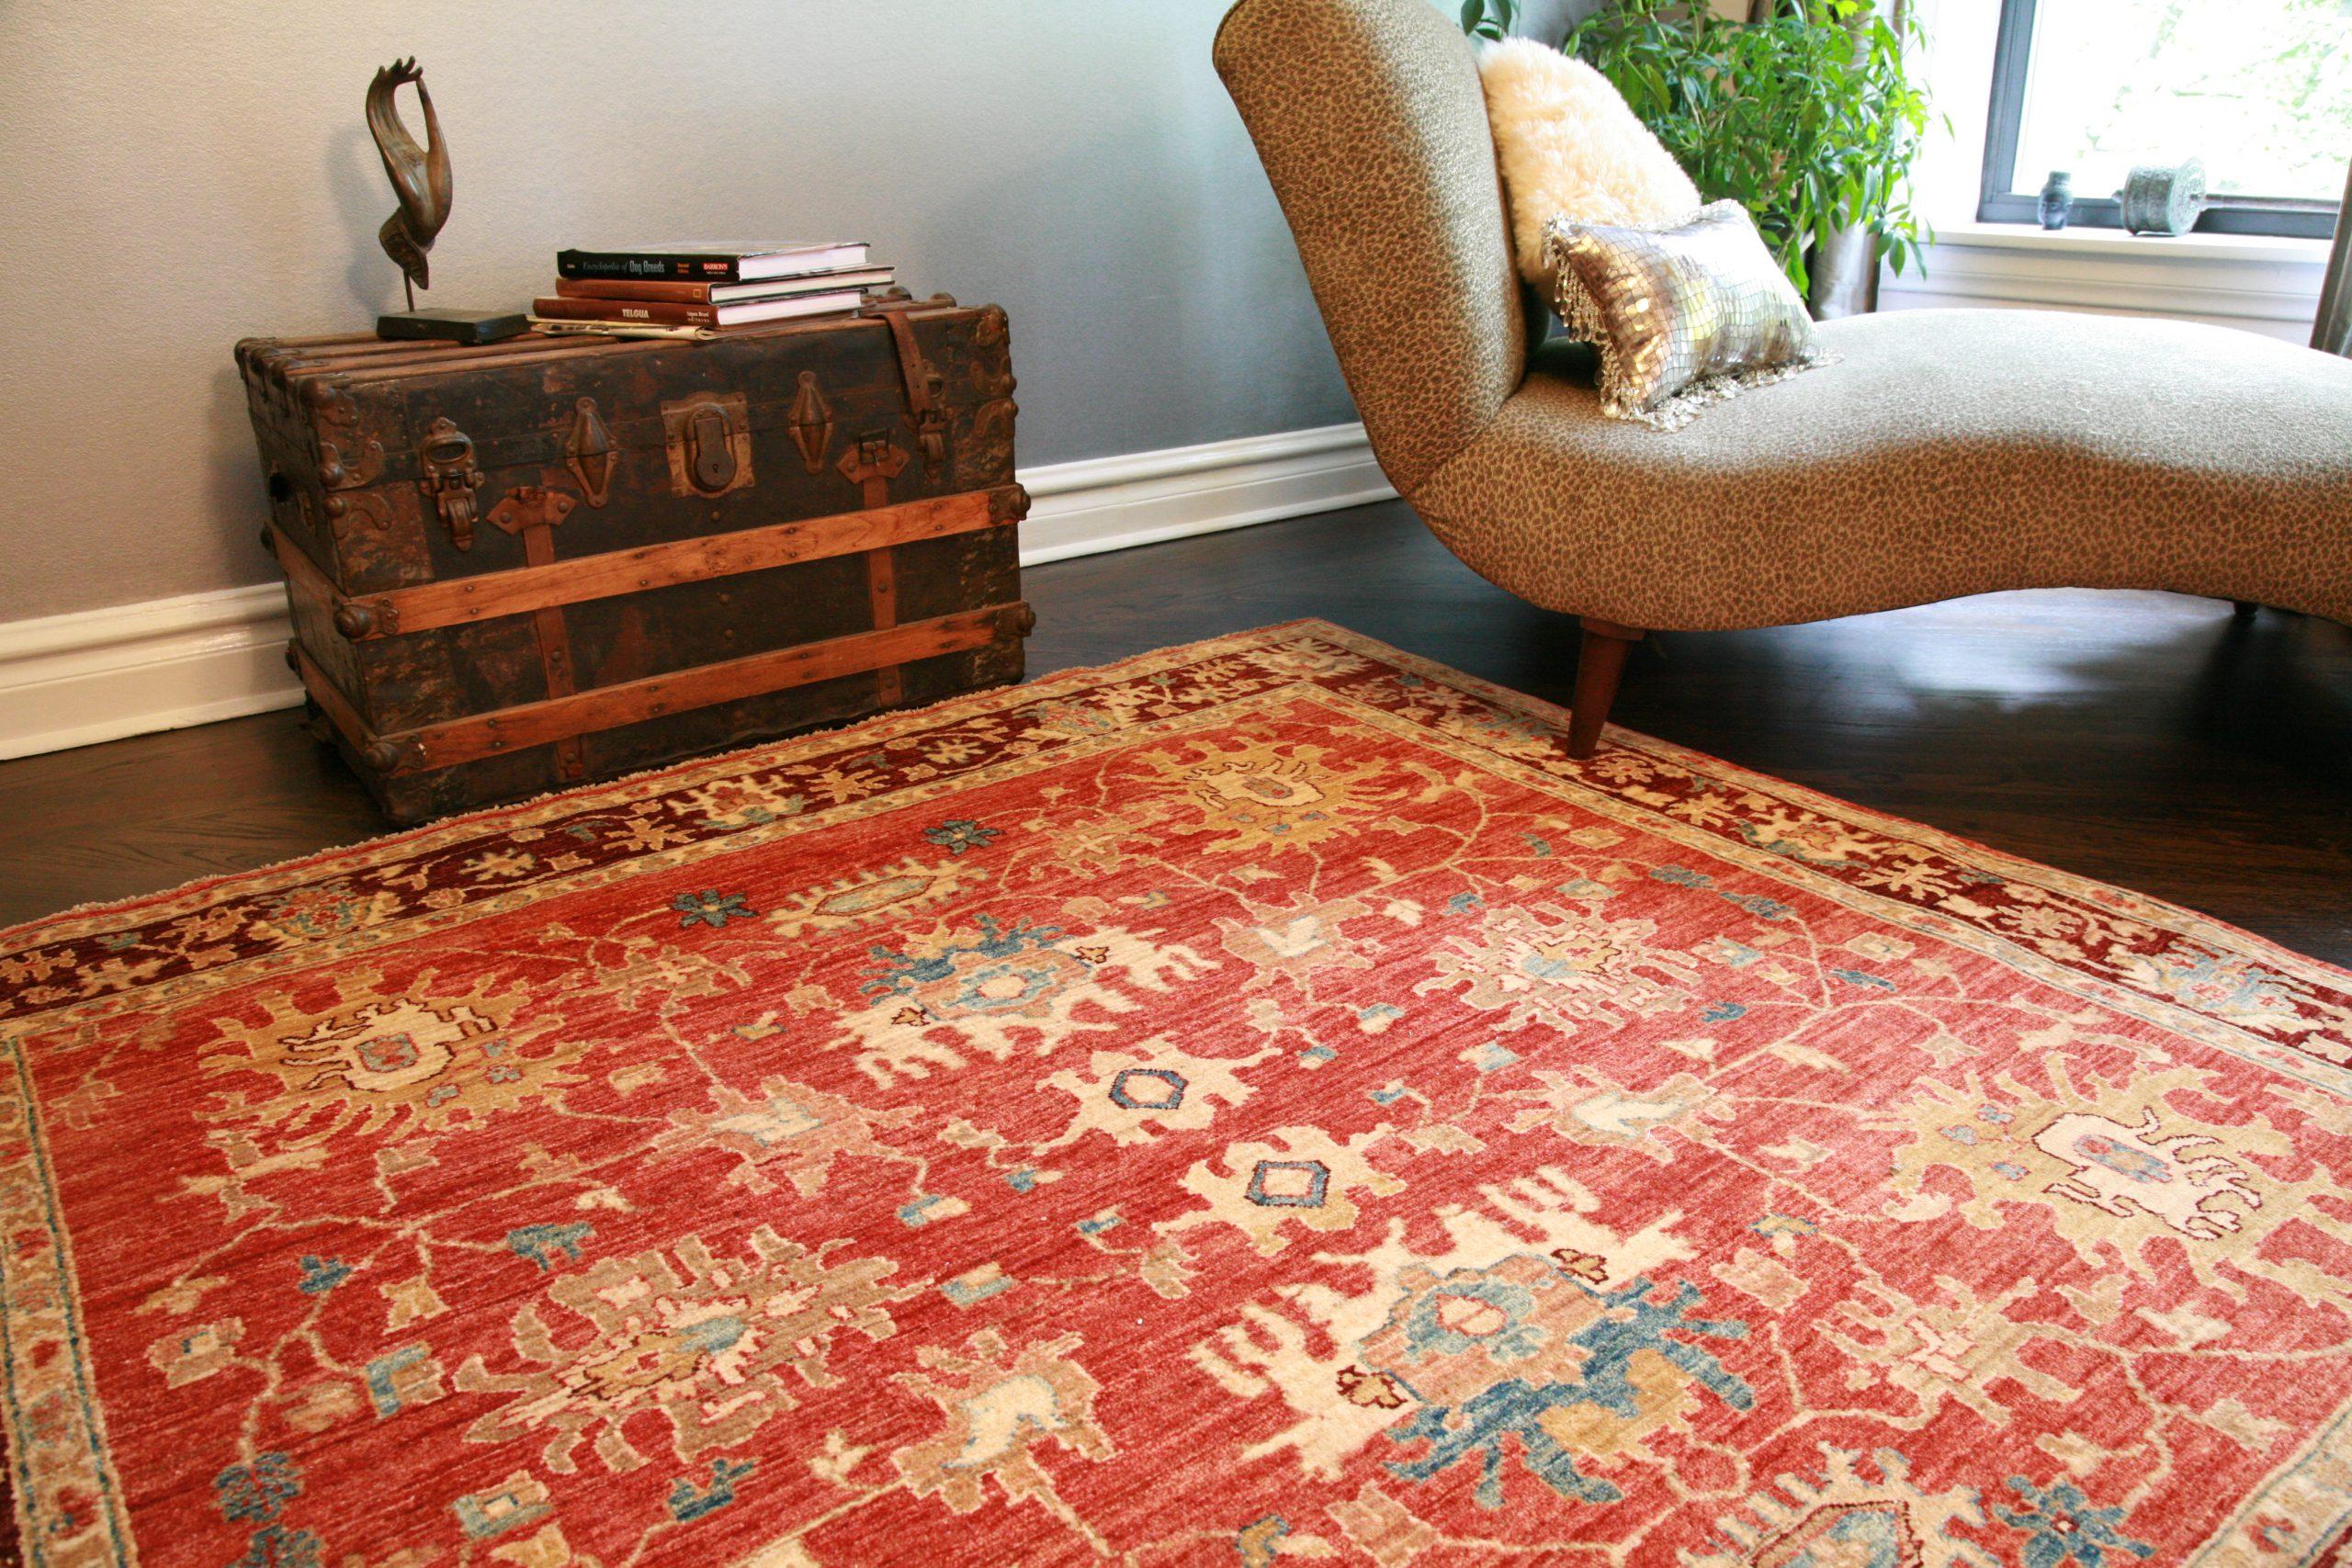 Red carpet in living room